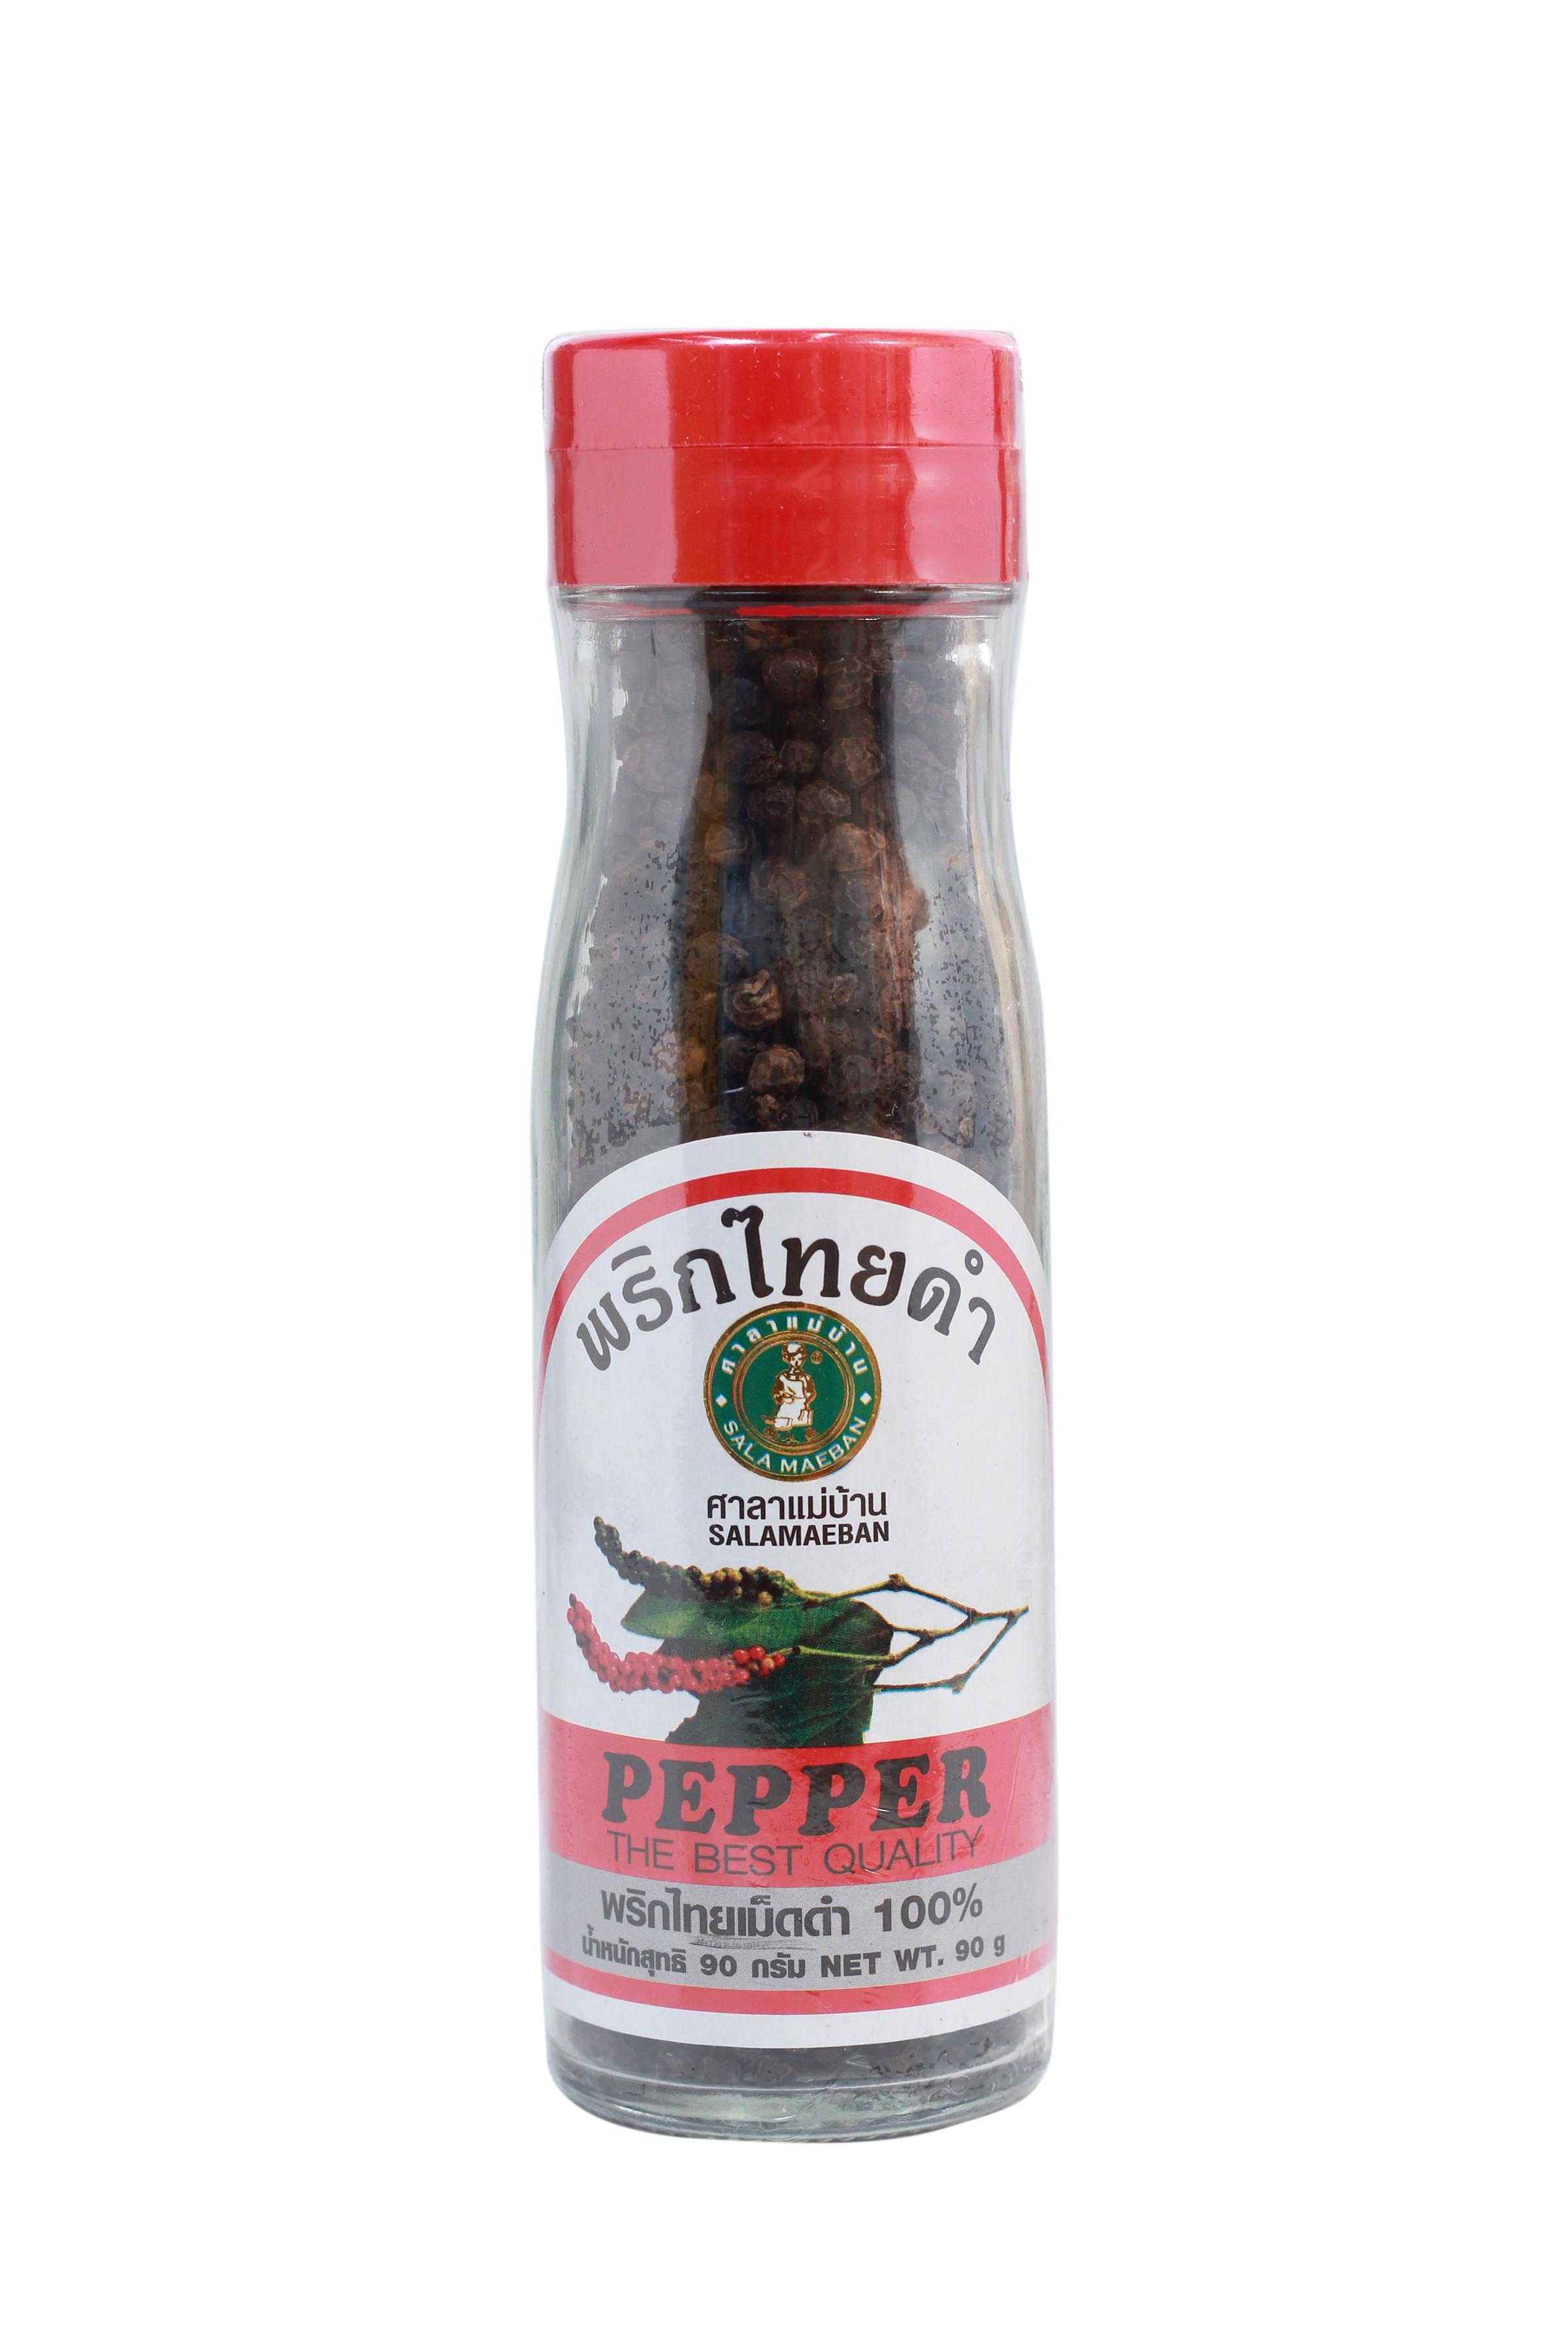 BLACK PEPPER (WHOLE) - พริกไทยเม็ดดำขวดใหญ่แม่บ้าน